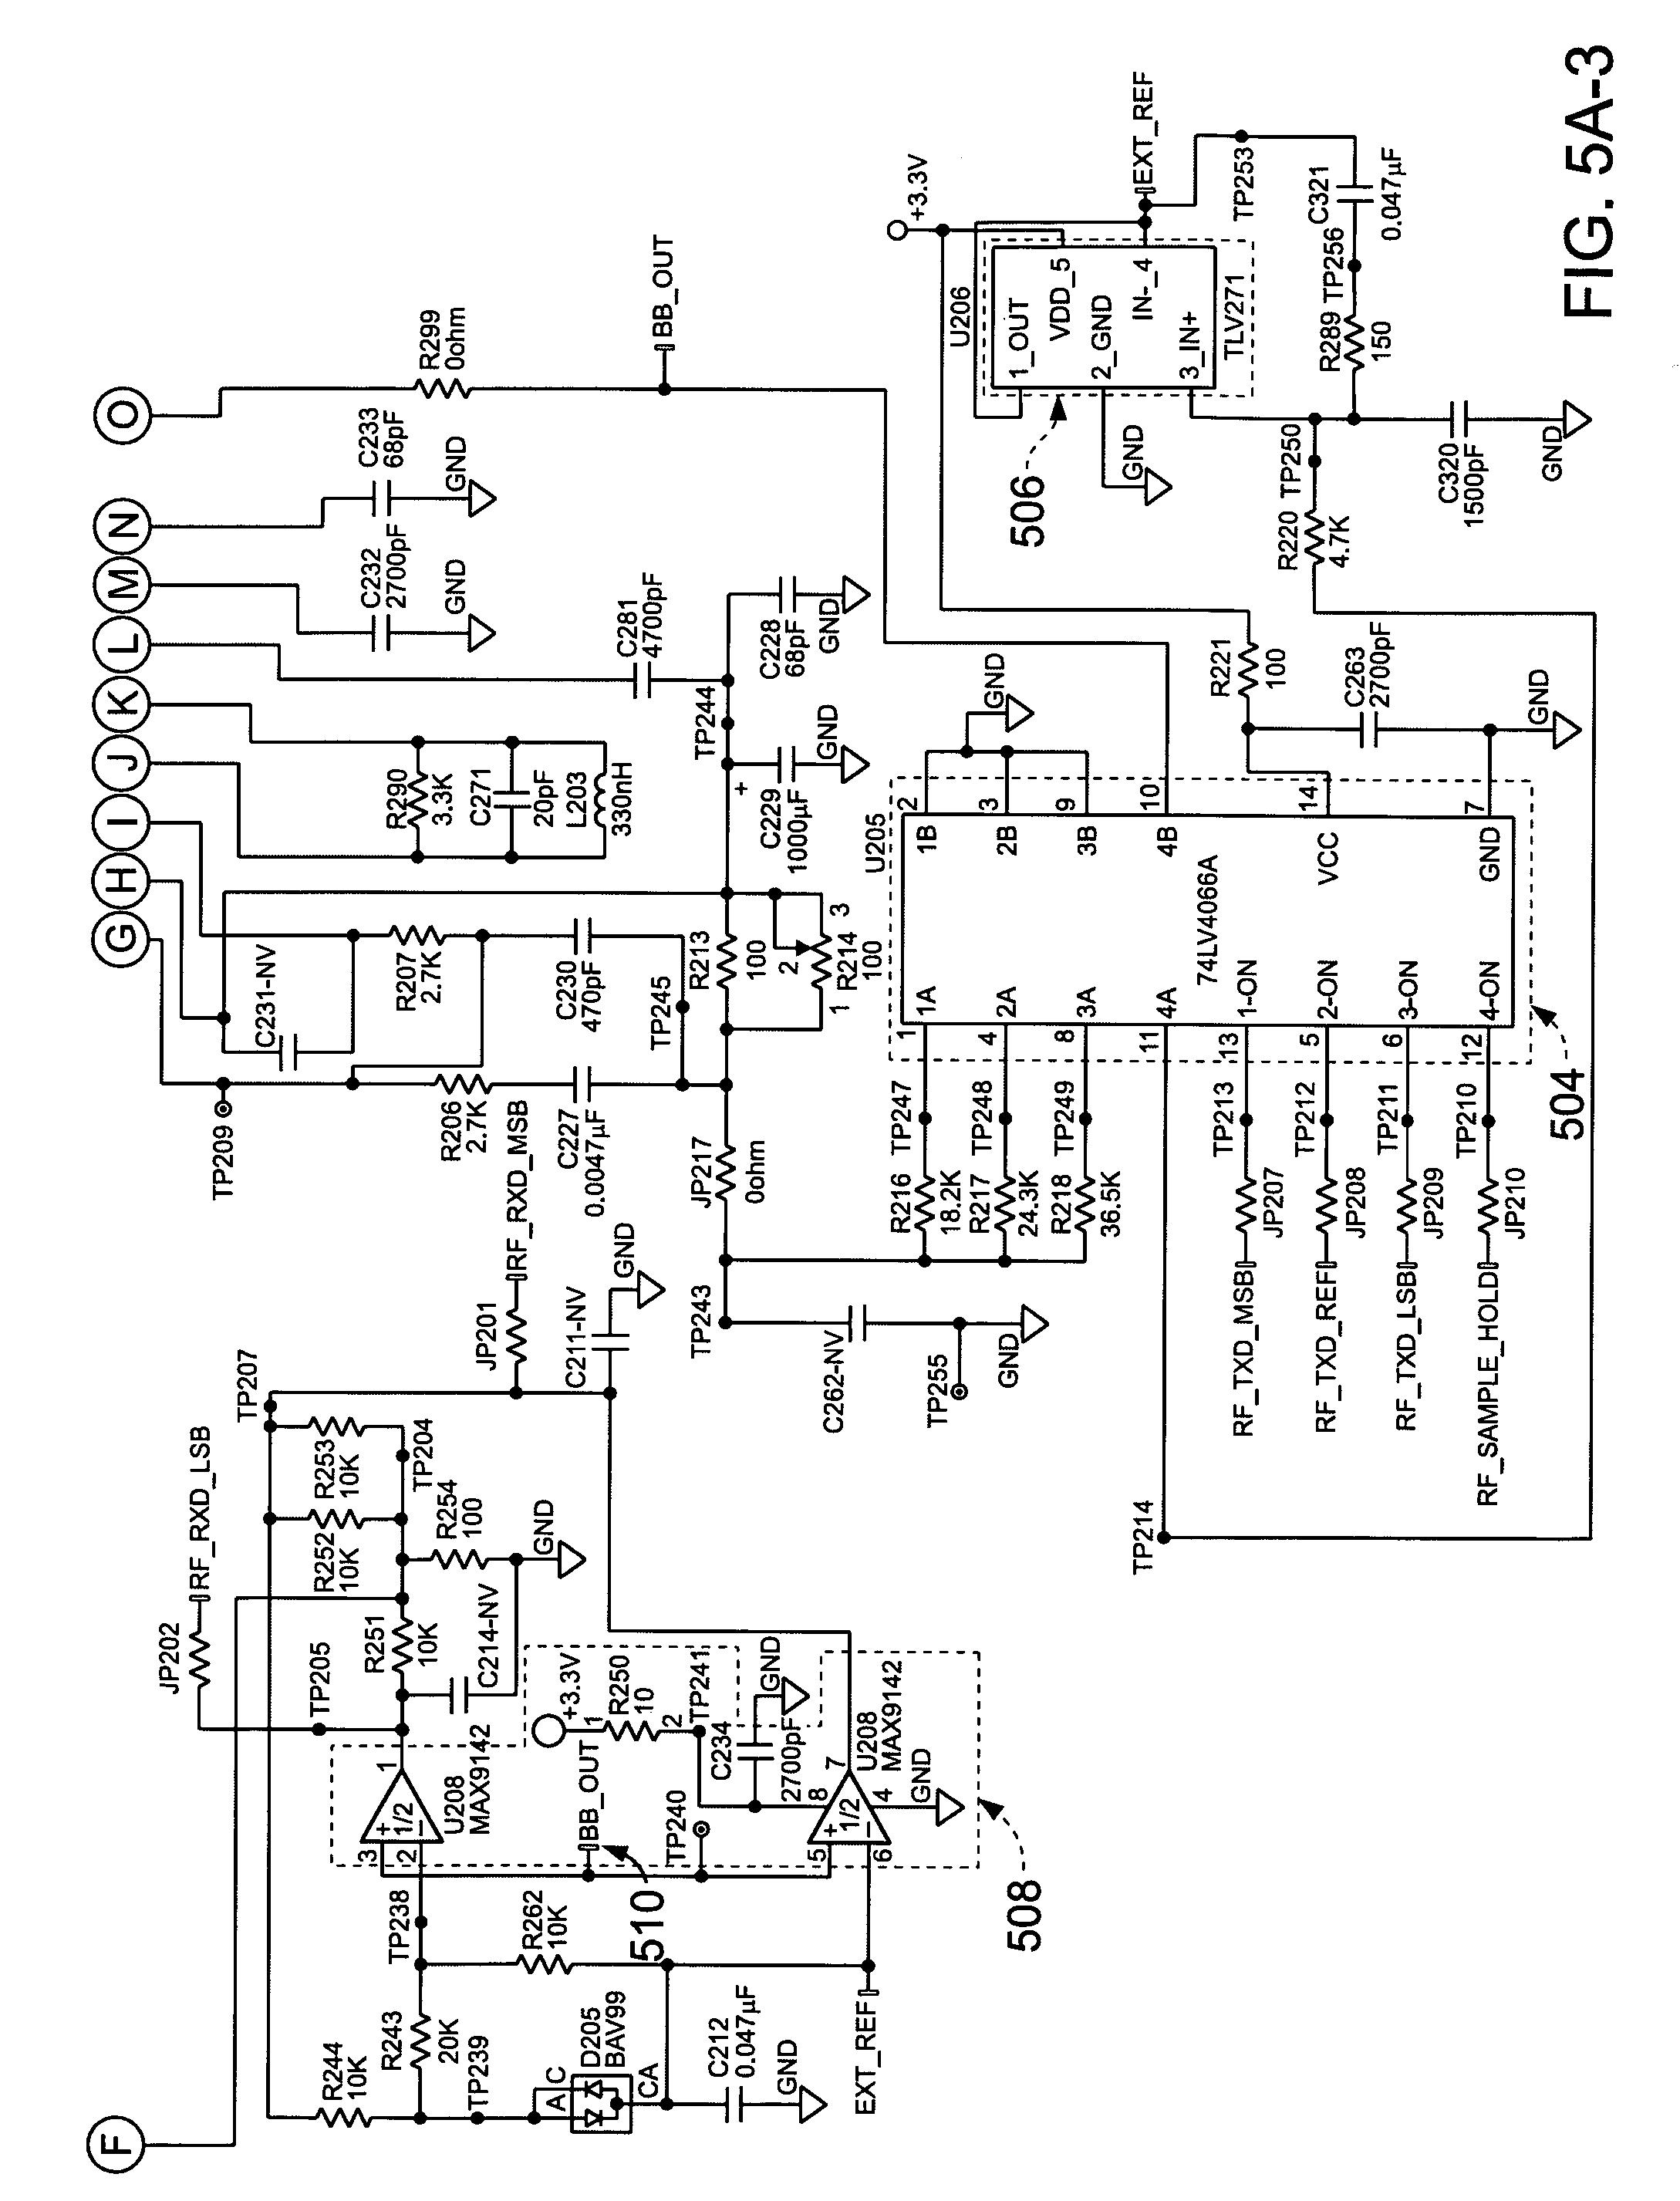 bose sounddock schematics auto electrical wiring diagram u2022 rh 6weeks co uk bose sounddock circuit diagram